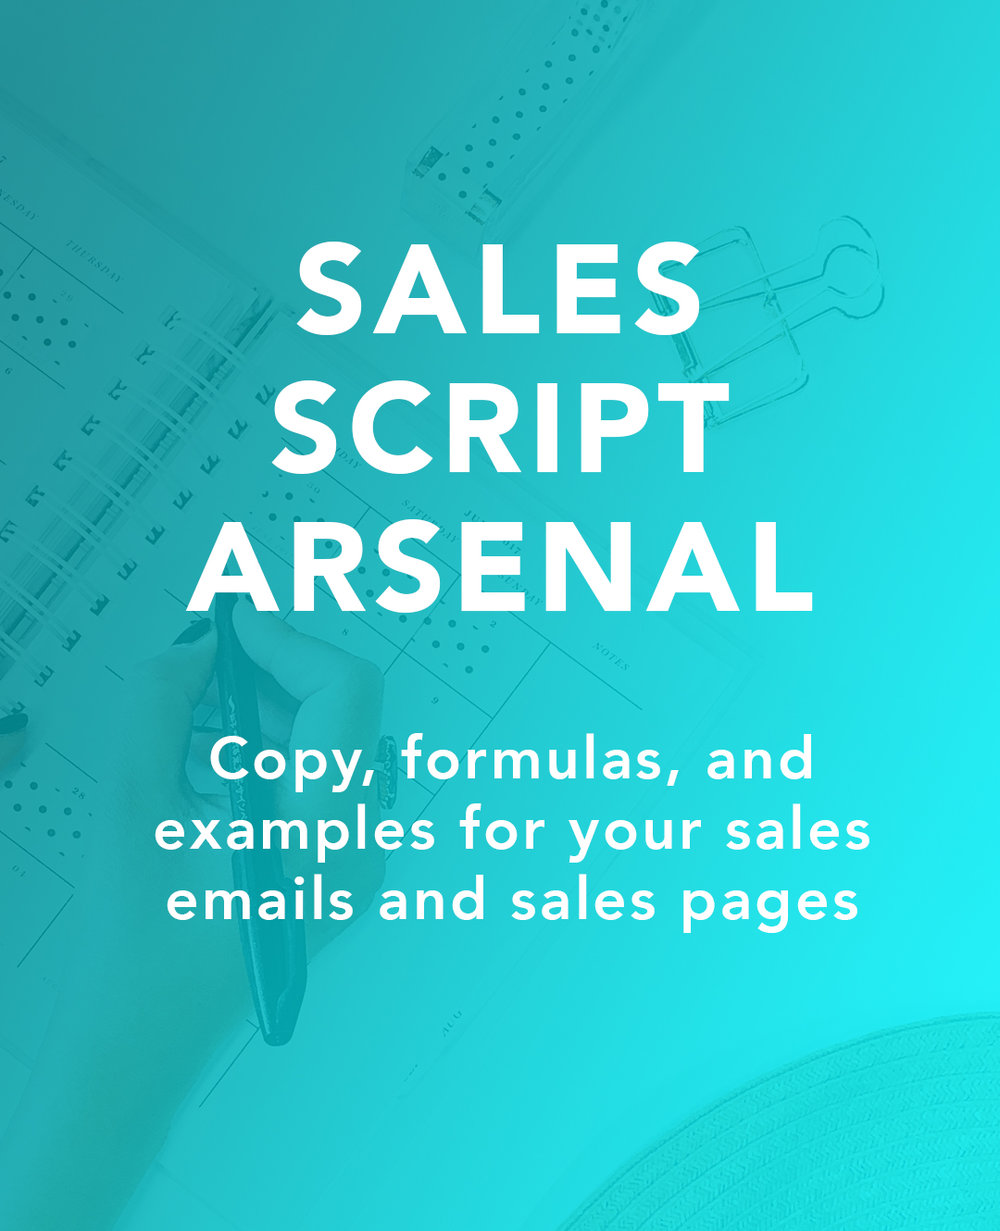 Sales-Script-Arsenal.jpg